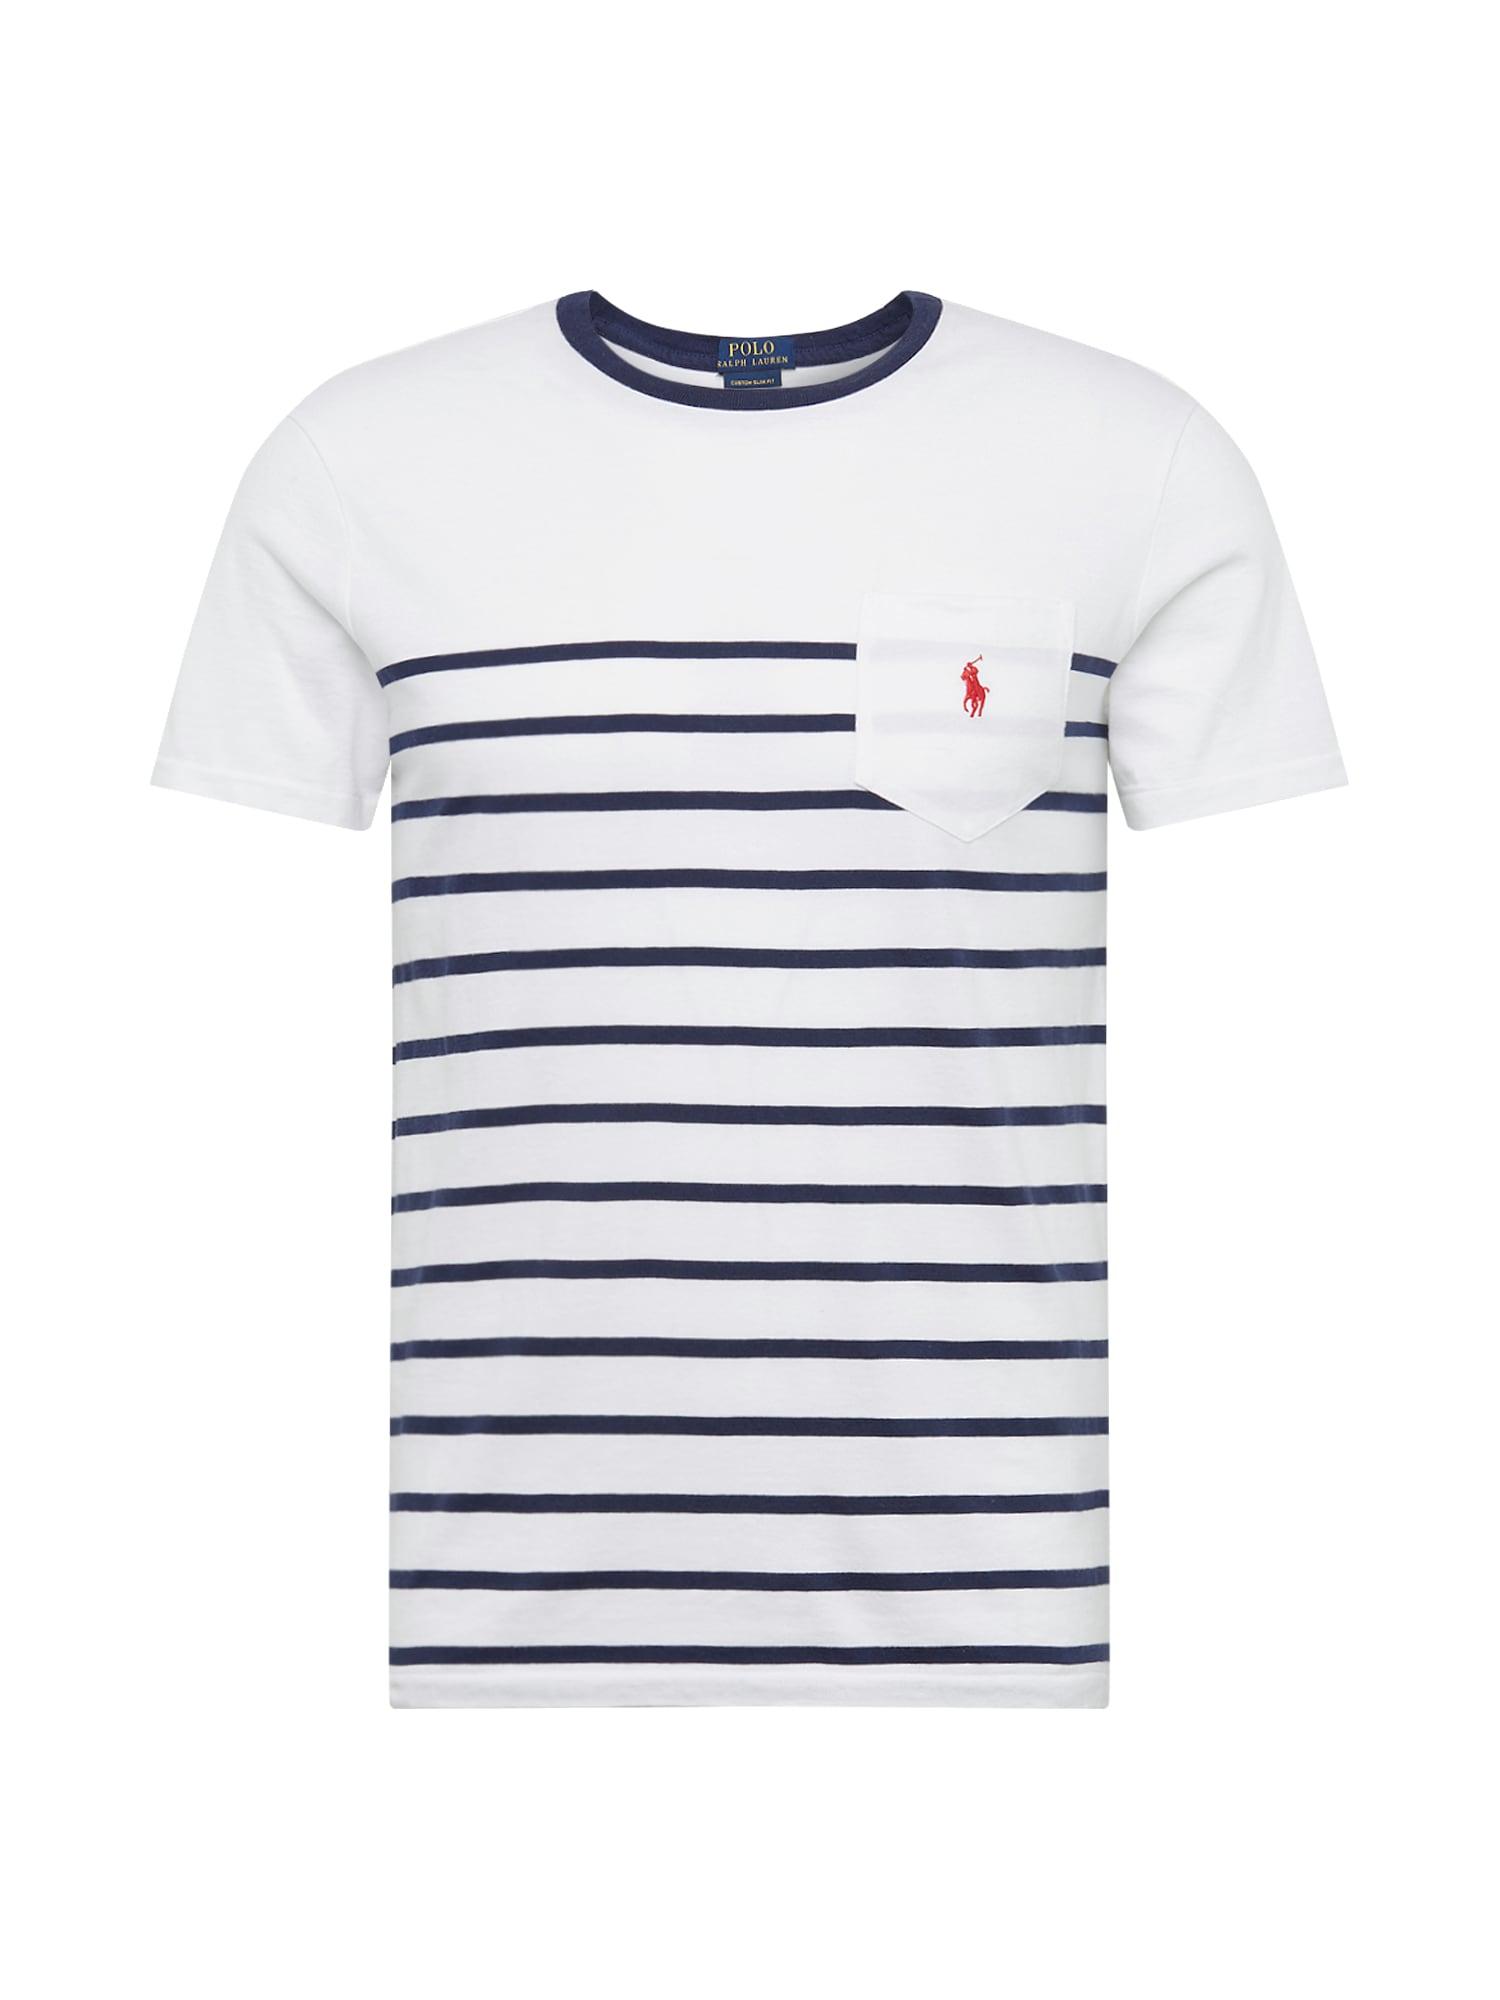 Tričko SSYDCNCMSL13-SHORT SLEEVE-T-SHIRT noční modrá bílá POLO RALPH LAUREN